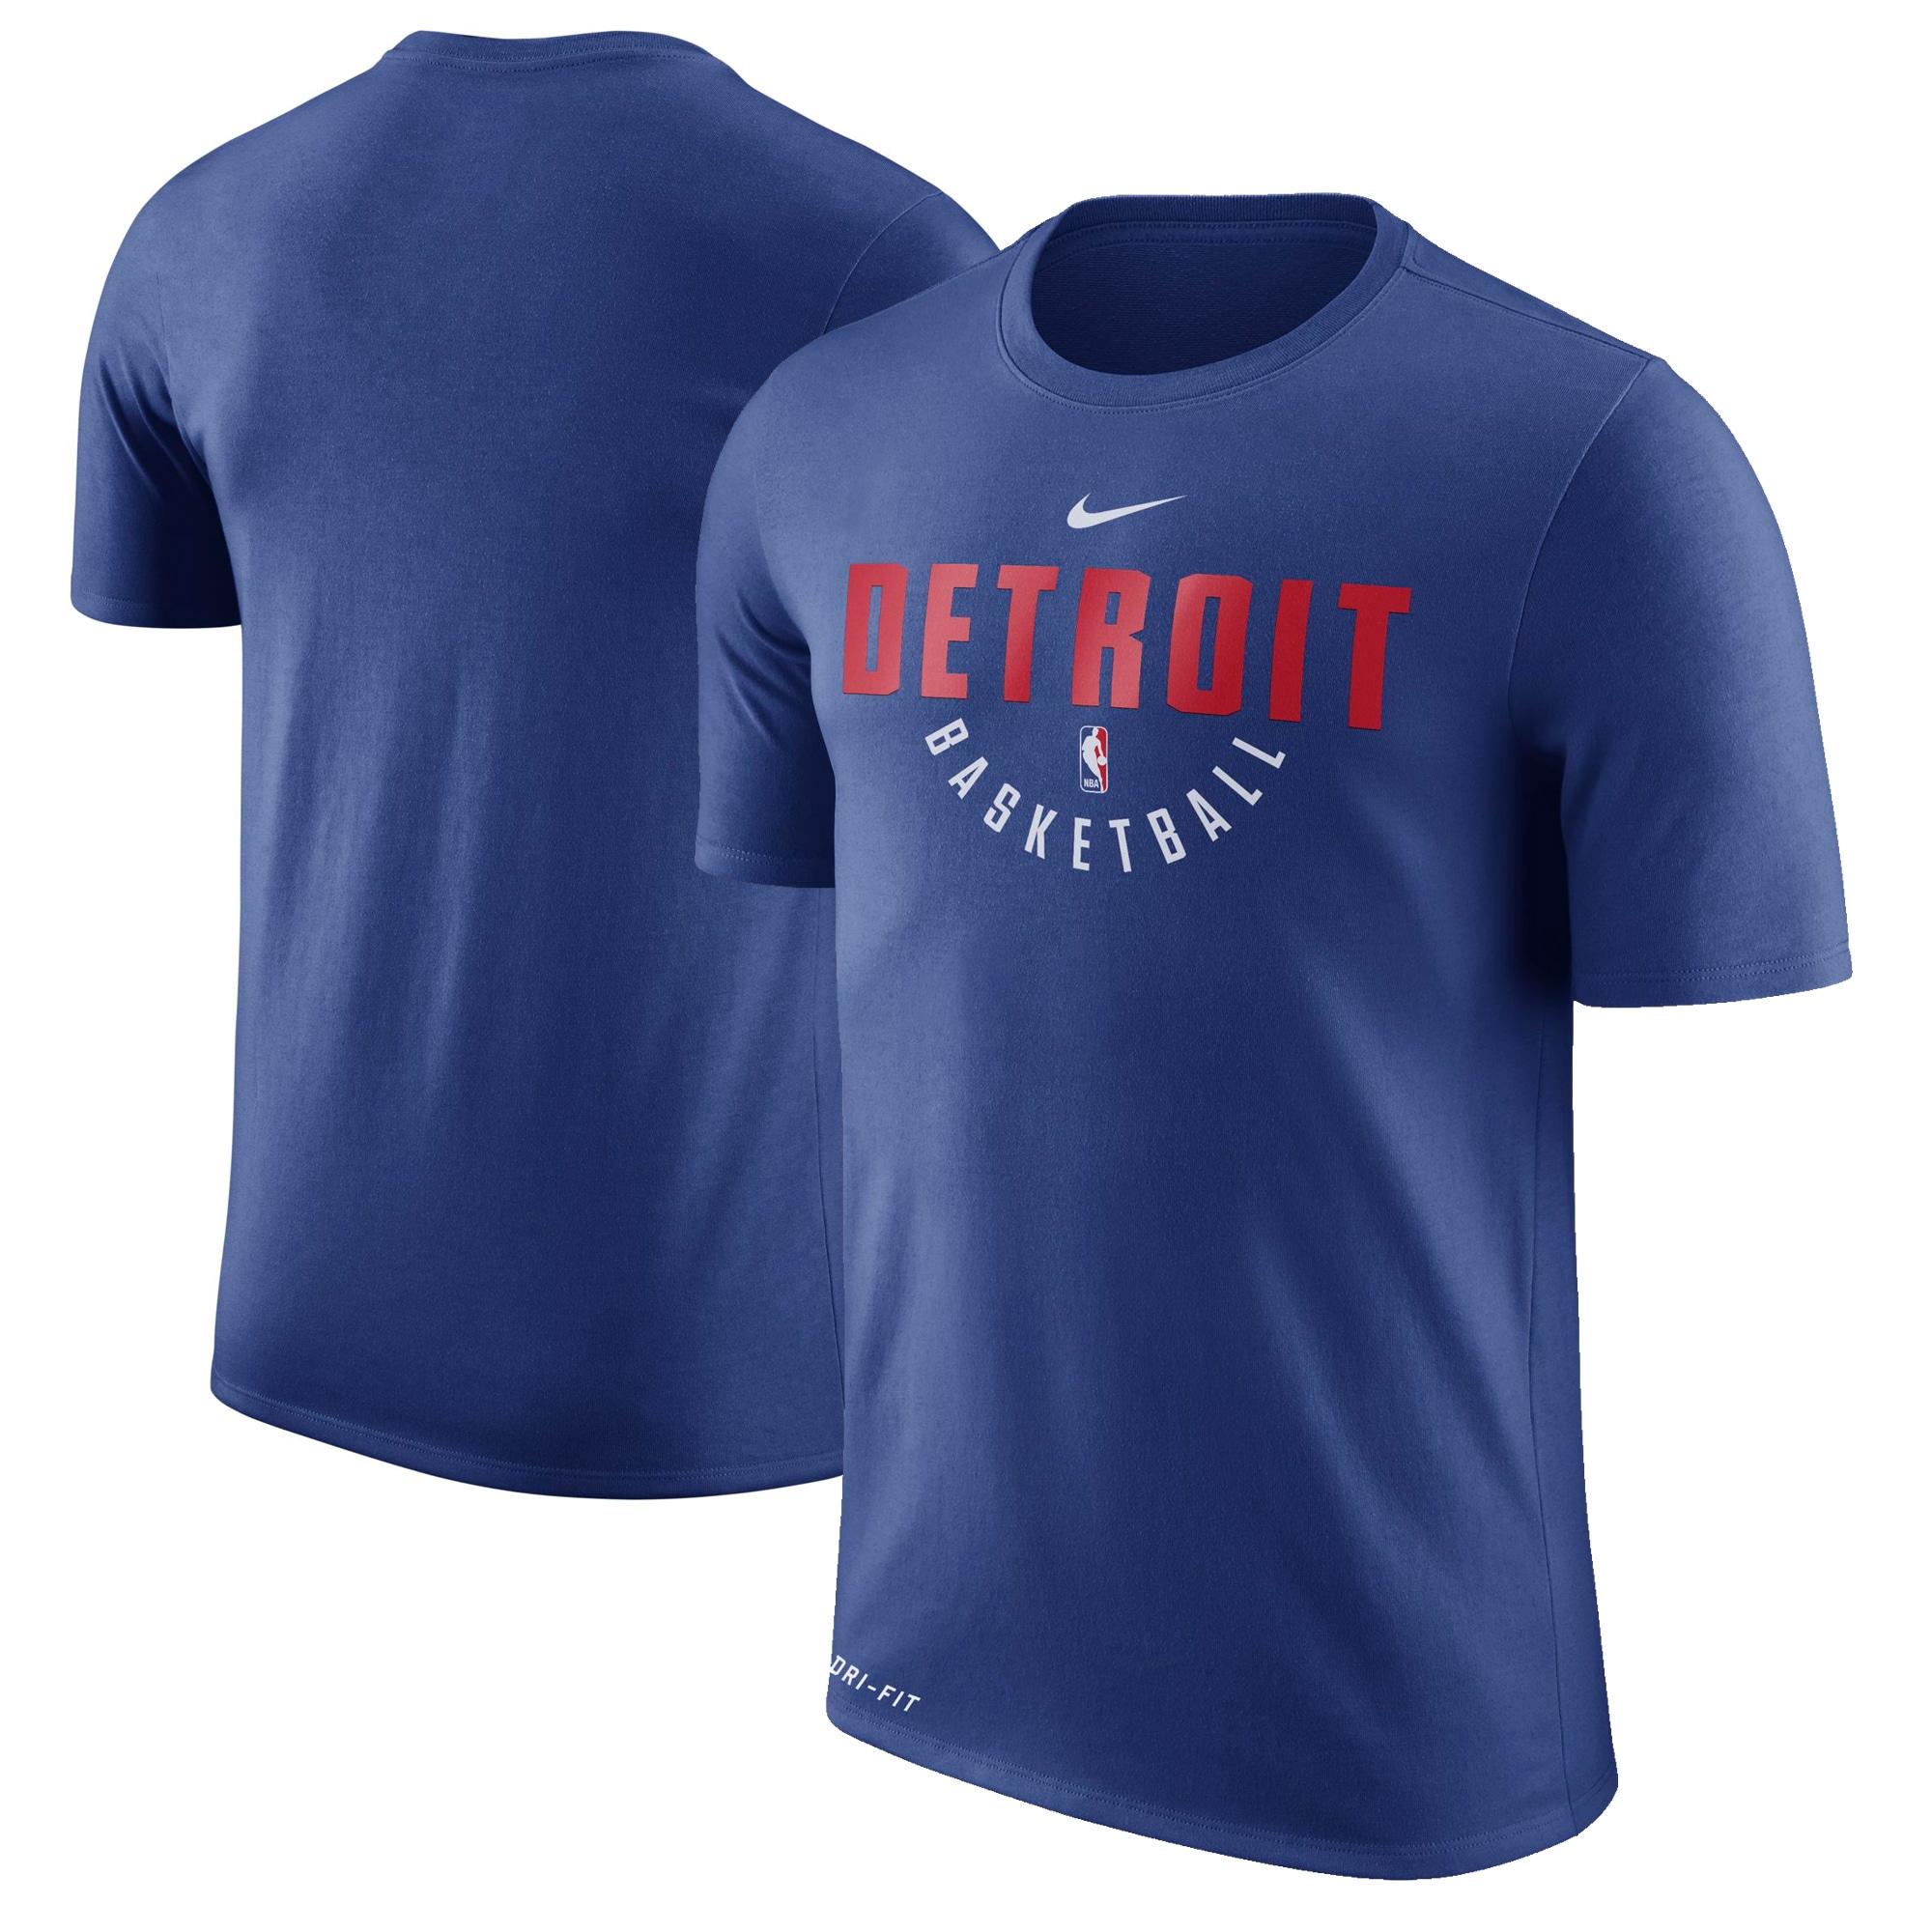 Detroit Pistons Nike Practice Performance T-Shirt - Blue